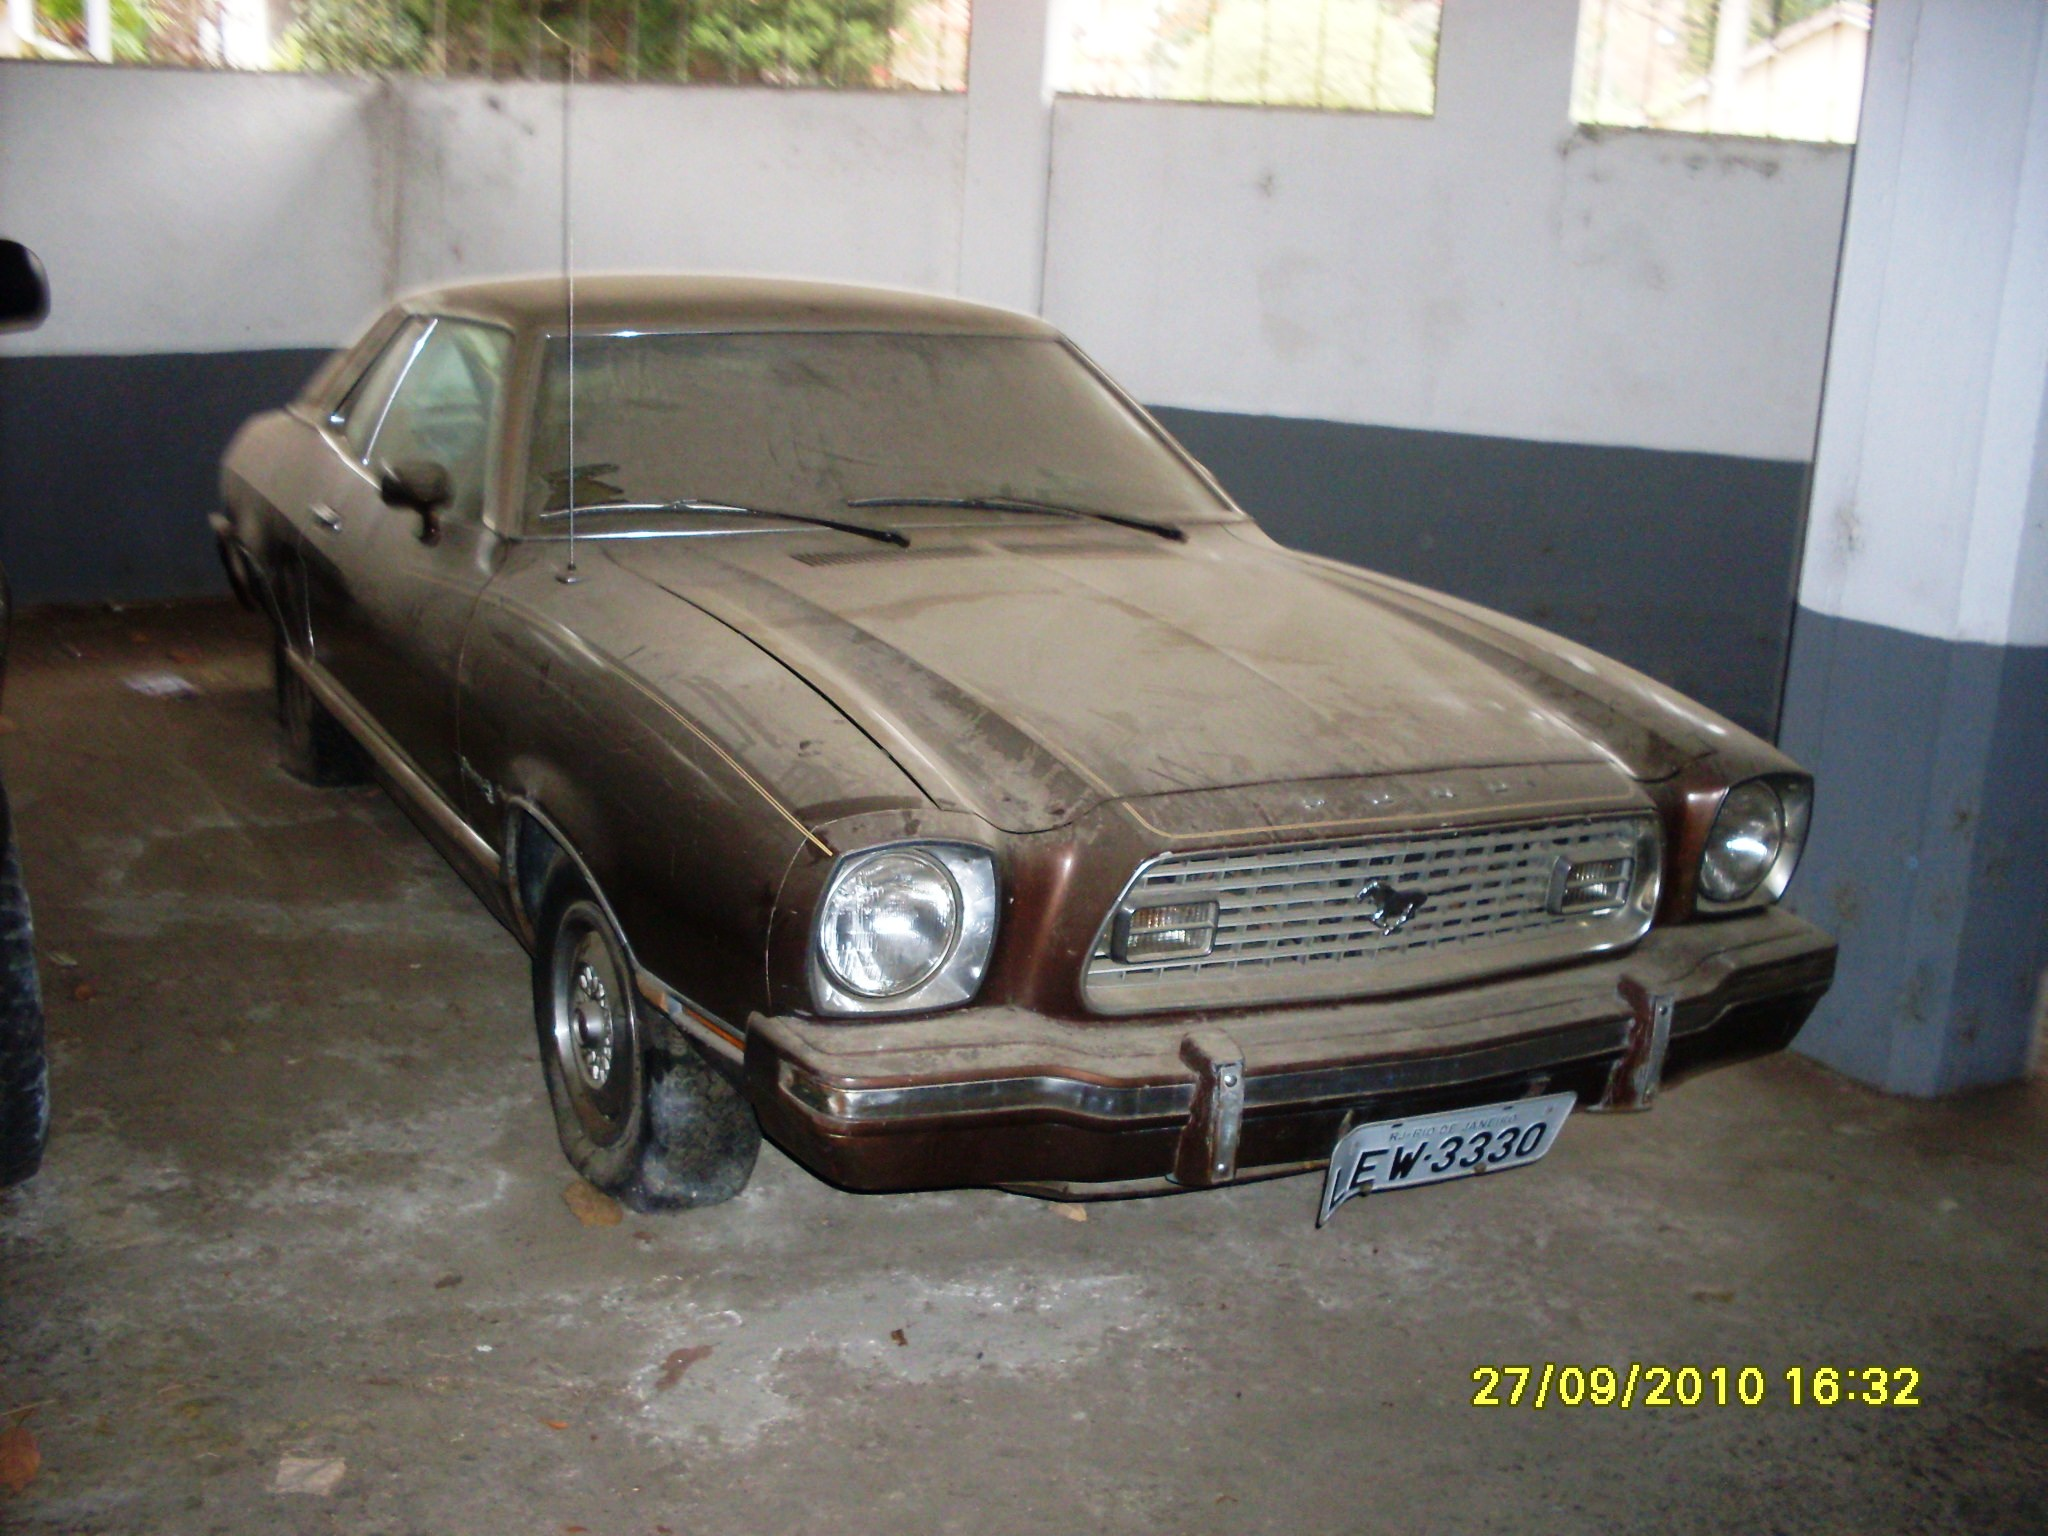 mateus-badolati-mustang-miguel-pereira-rj Ford Mustang!